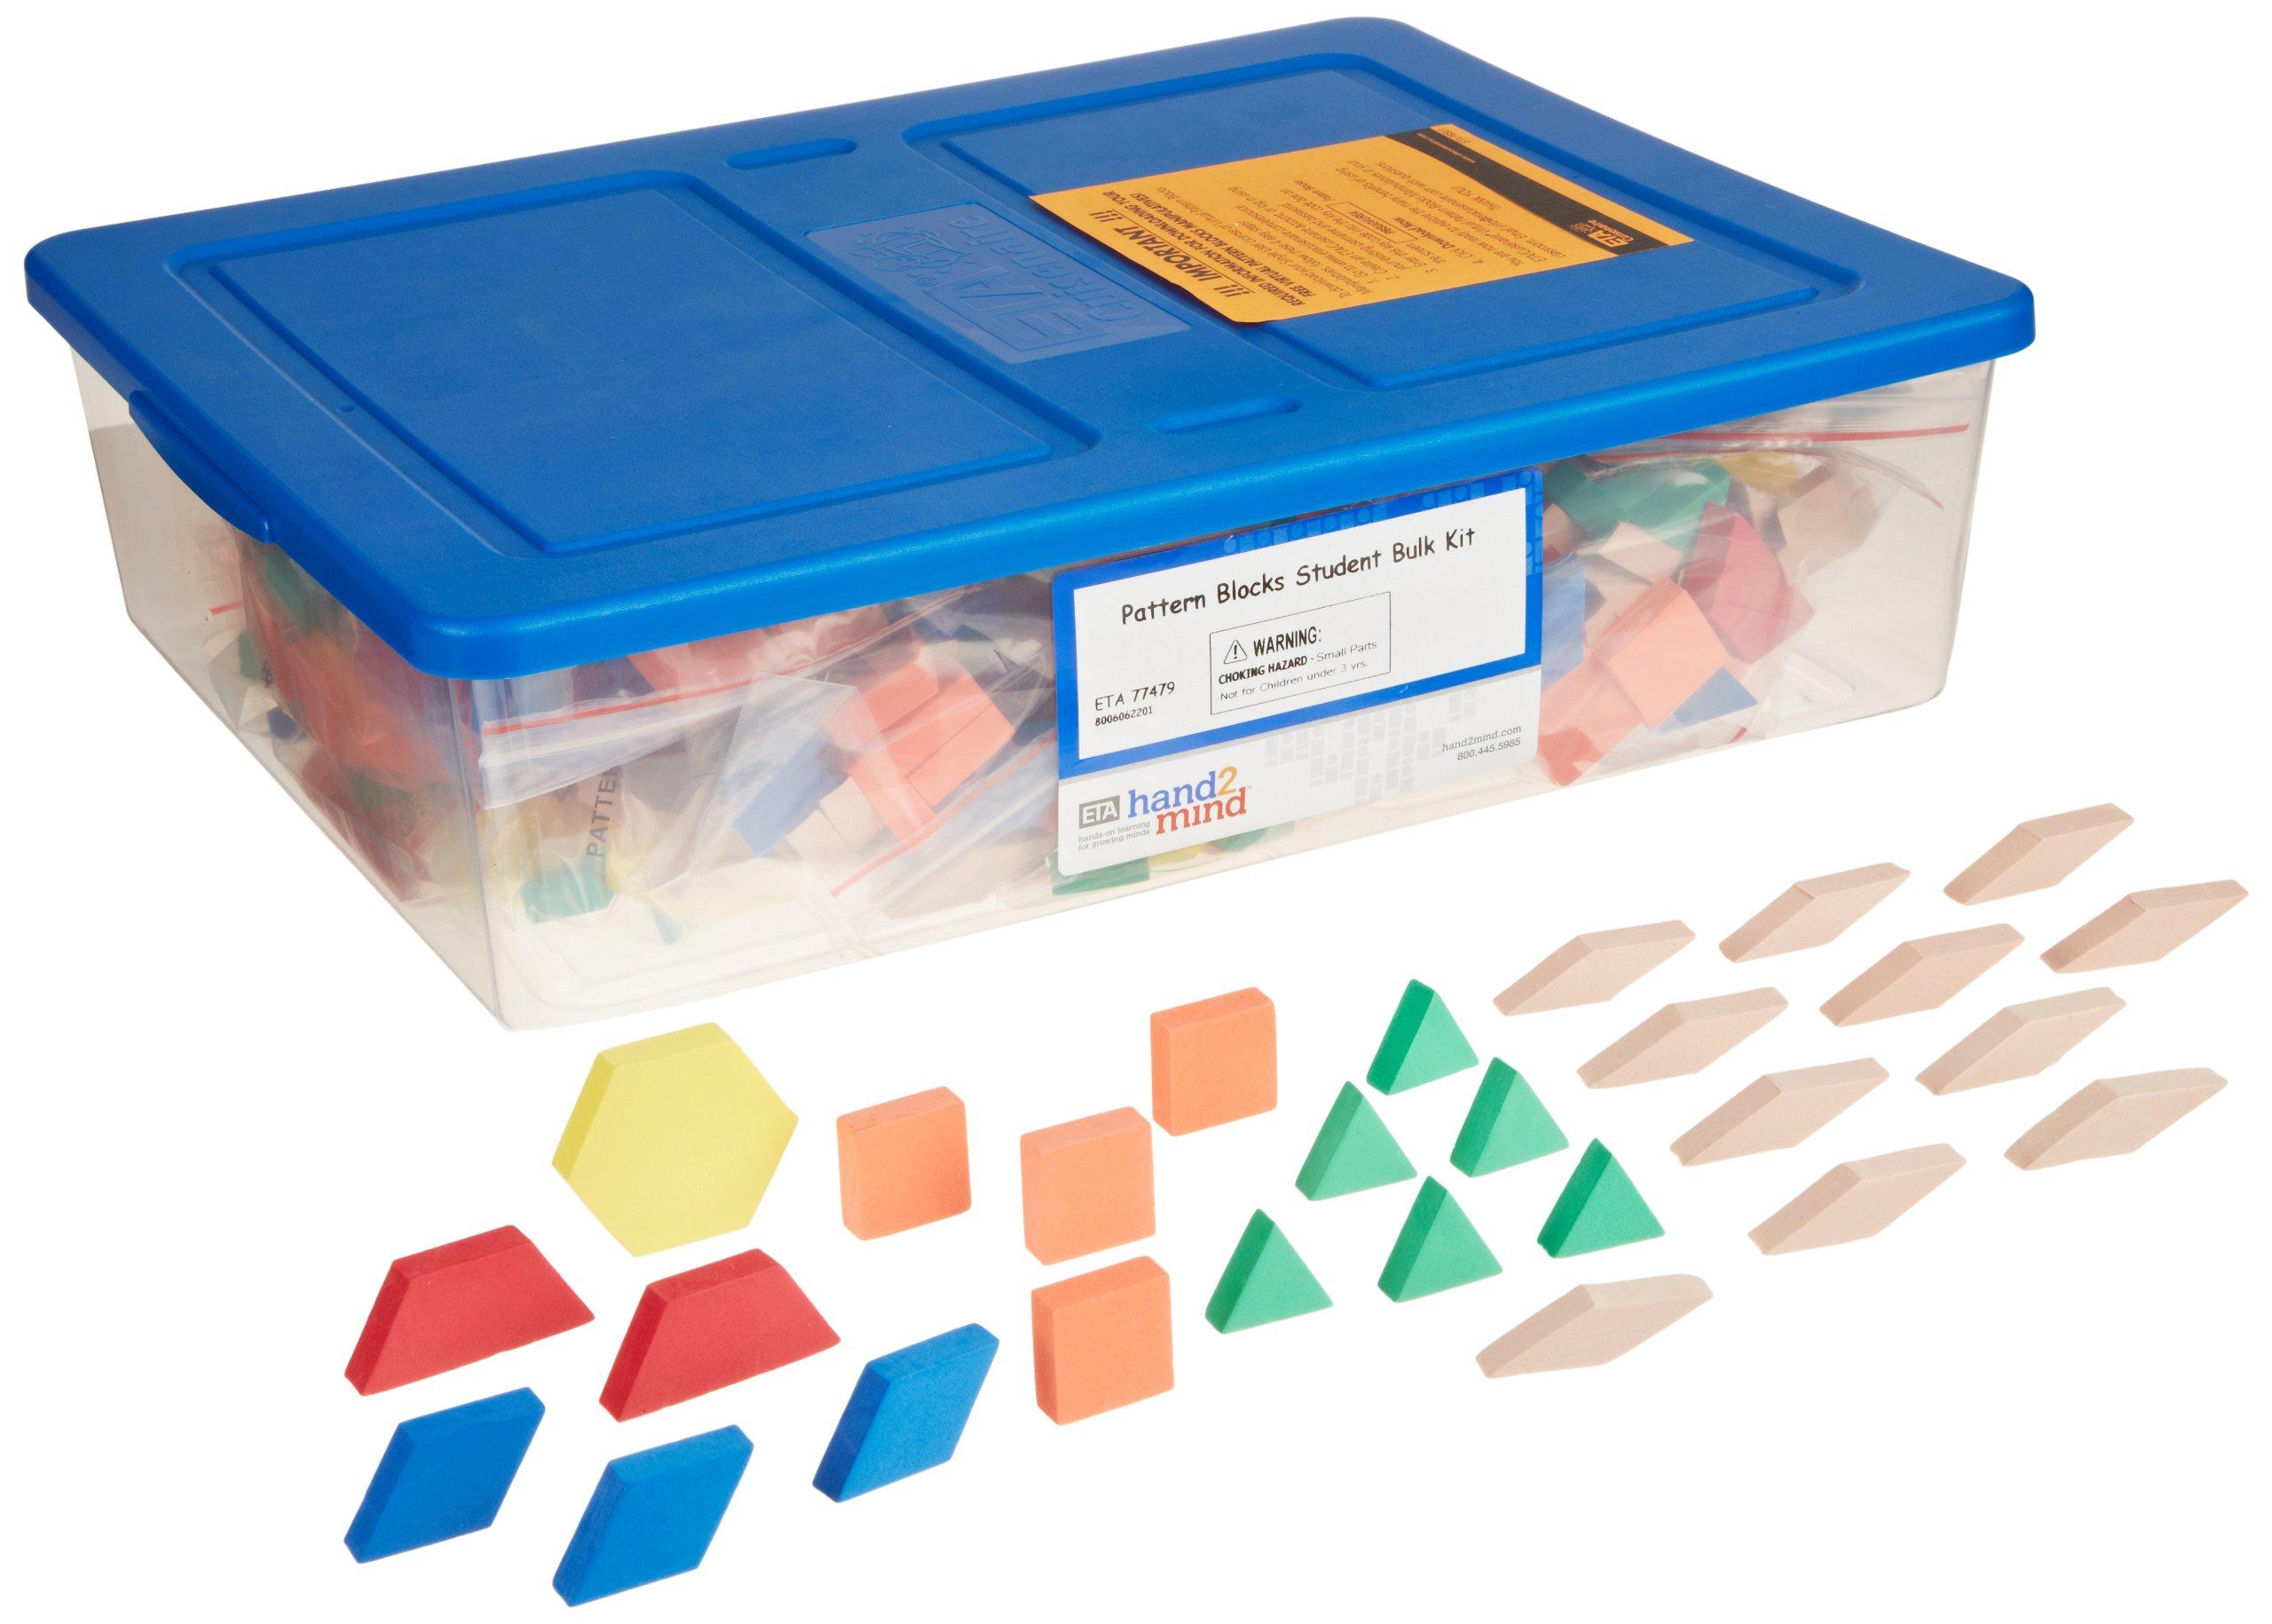 ETA hand2mind Foam Pattern Blocks Student Kit (Pack of 30)